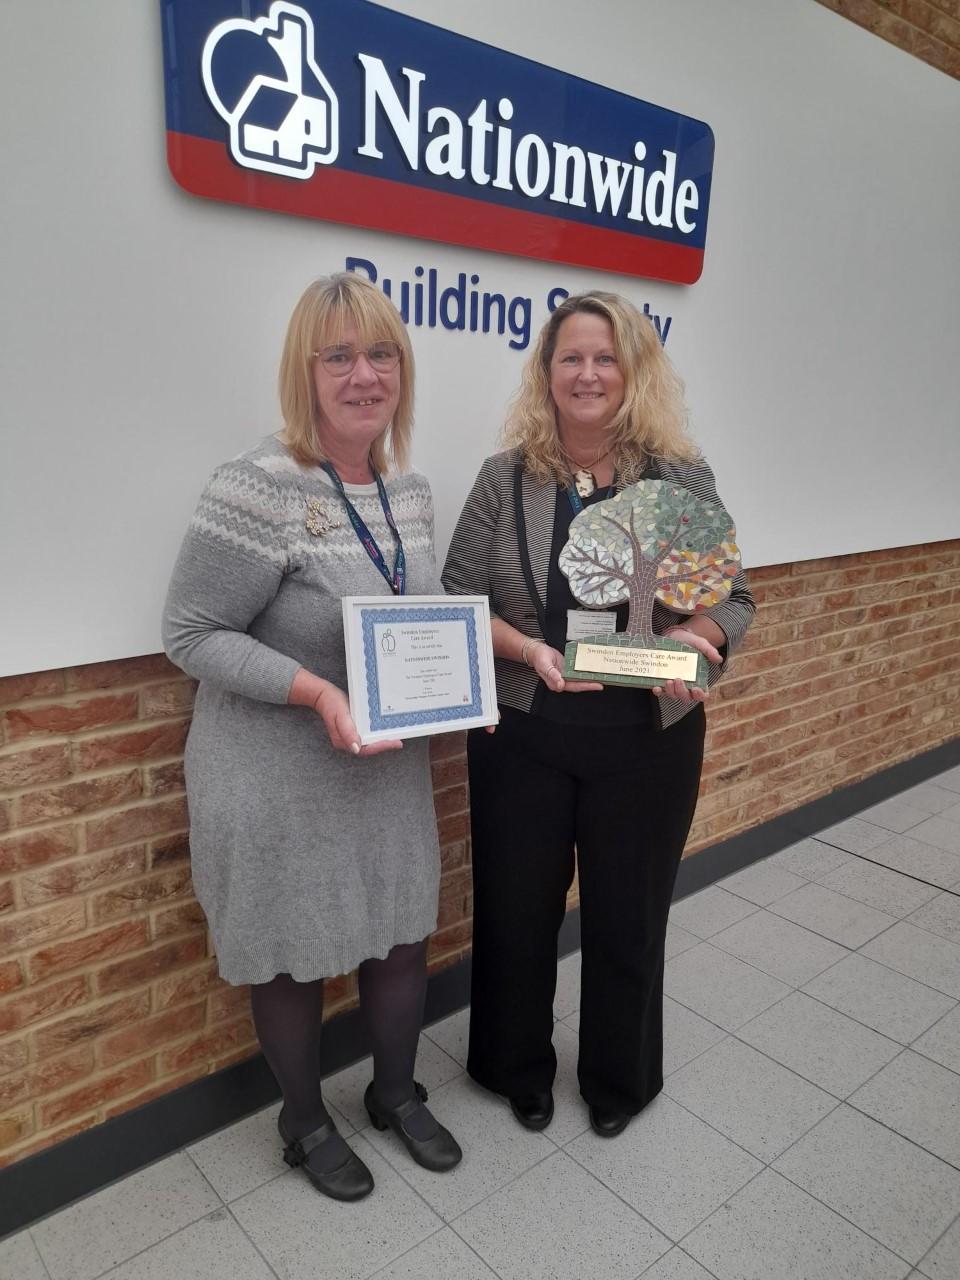 Nationwide achieves the Swindon Employers Care Award